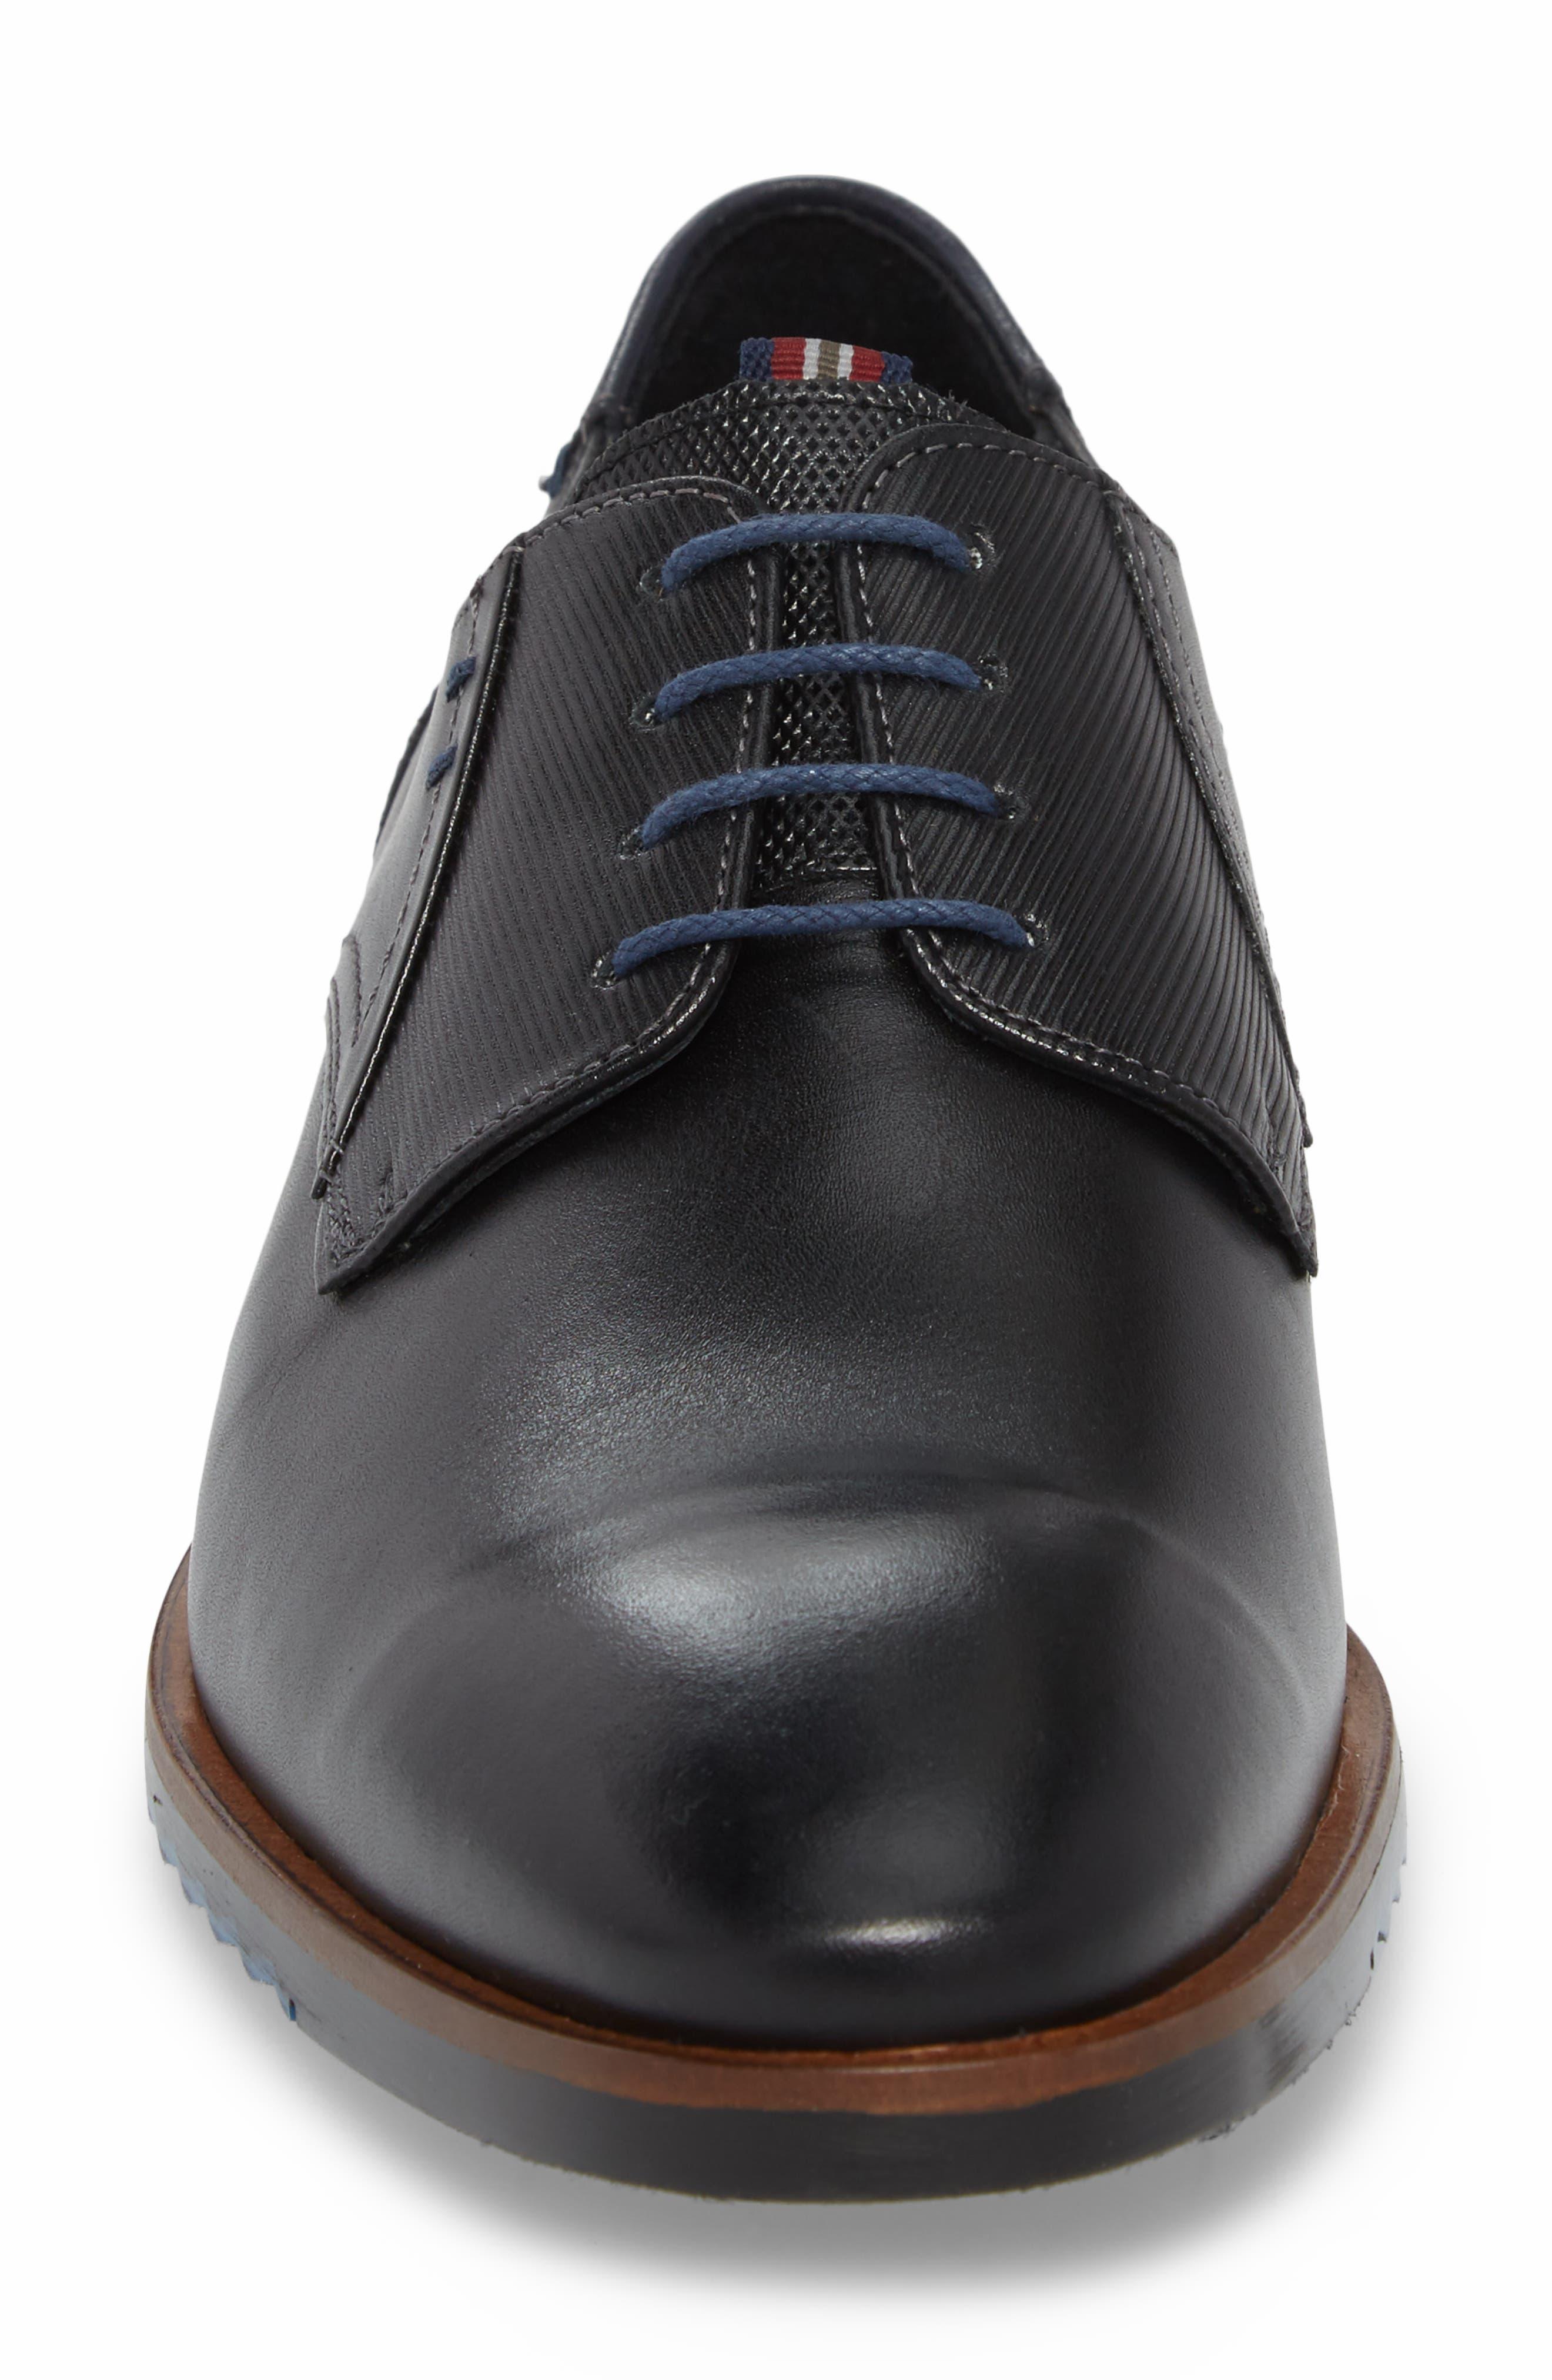 Deno Plain Toe Derby,                             Alternate thumbnail 4, color,                             BLACK/ BLUE LEATHER